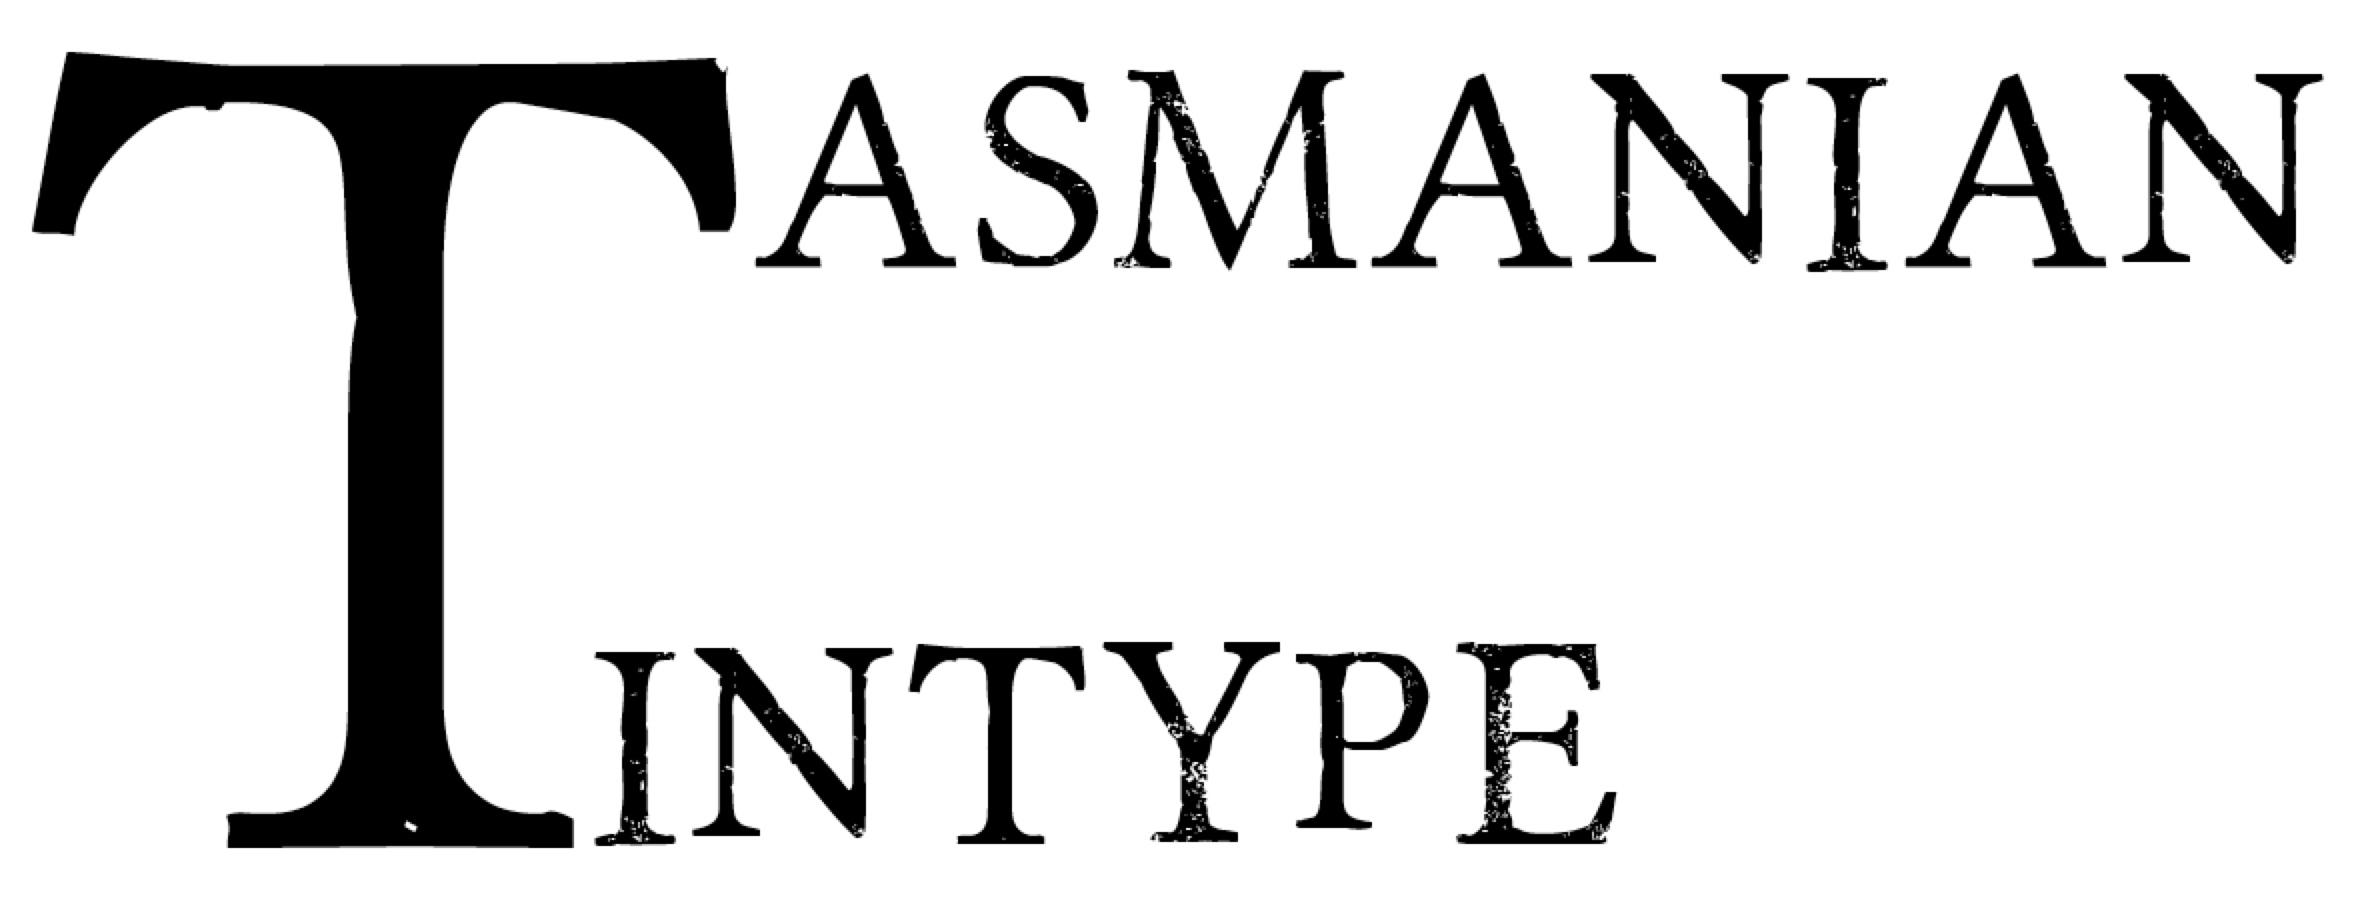 Tasmanian-Tin-Type-LOGO